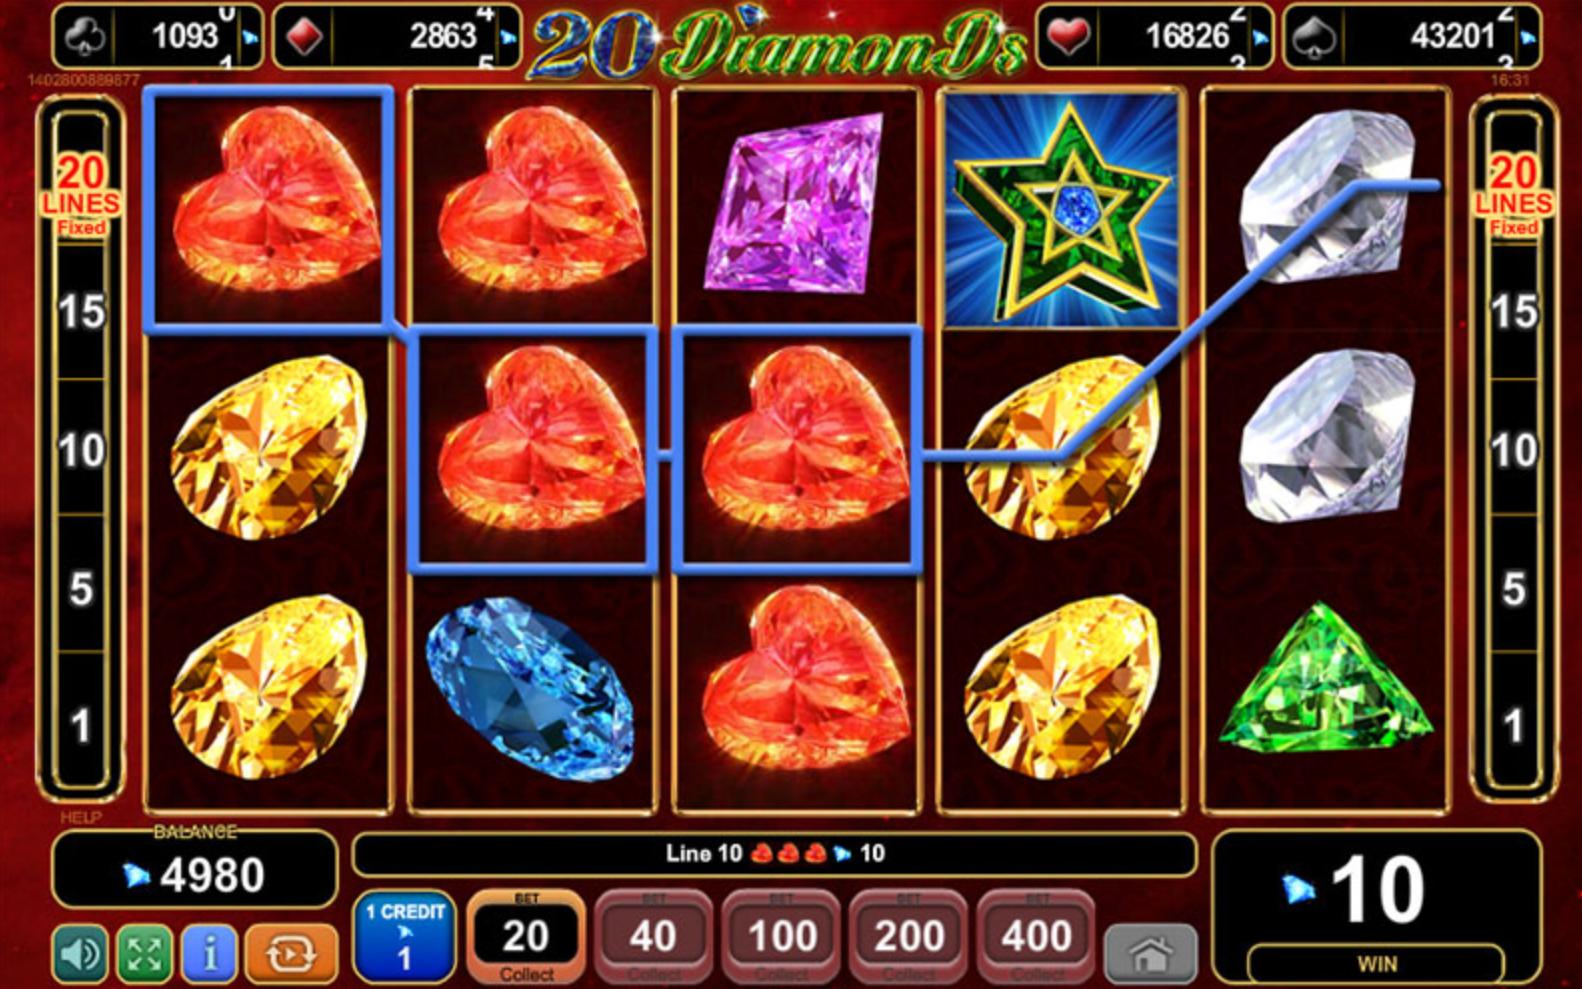 Nye spillemaskiner fra Diamonds